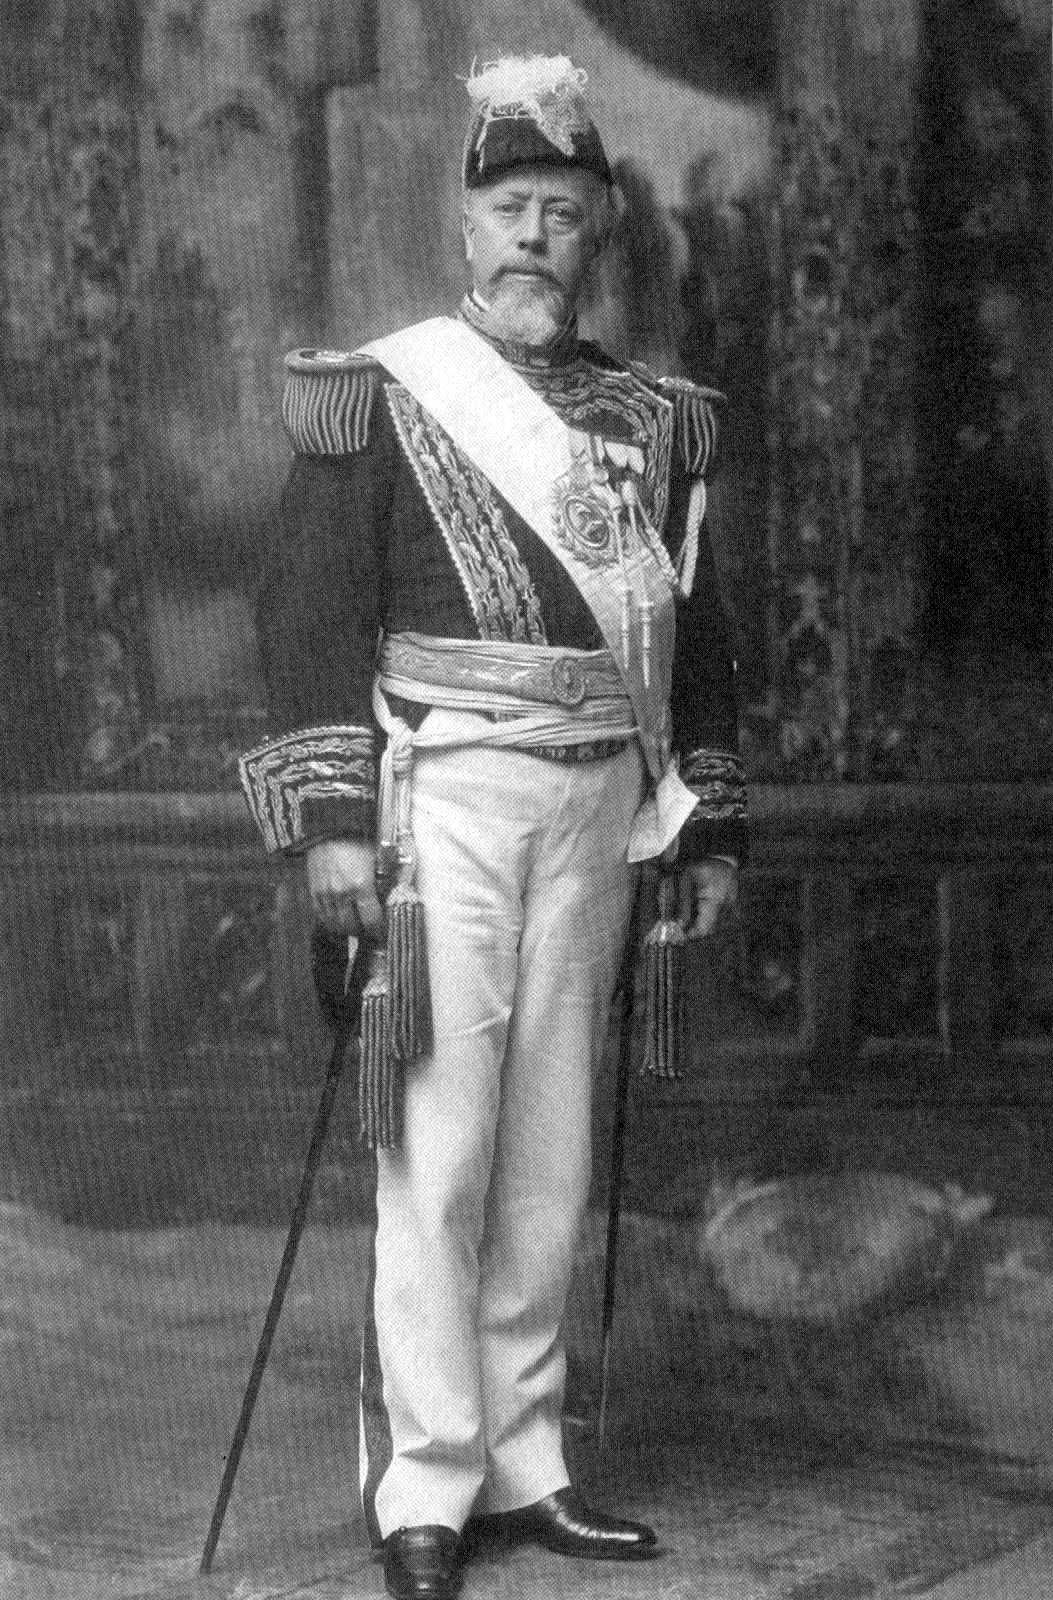 Depiction of Julio Argentino Roca